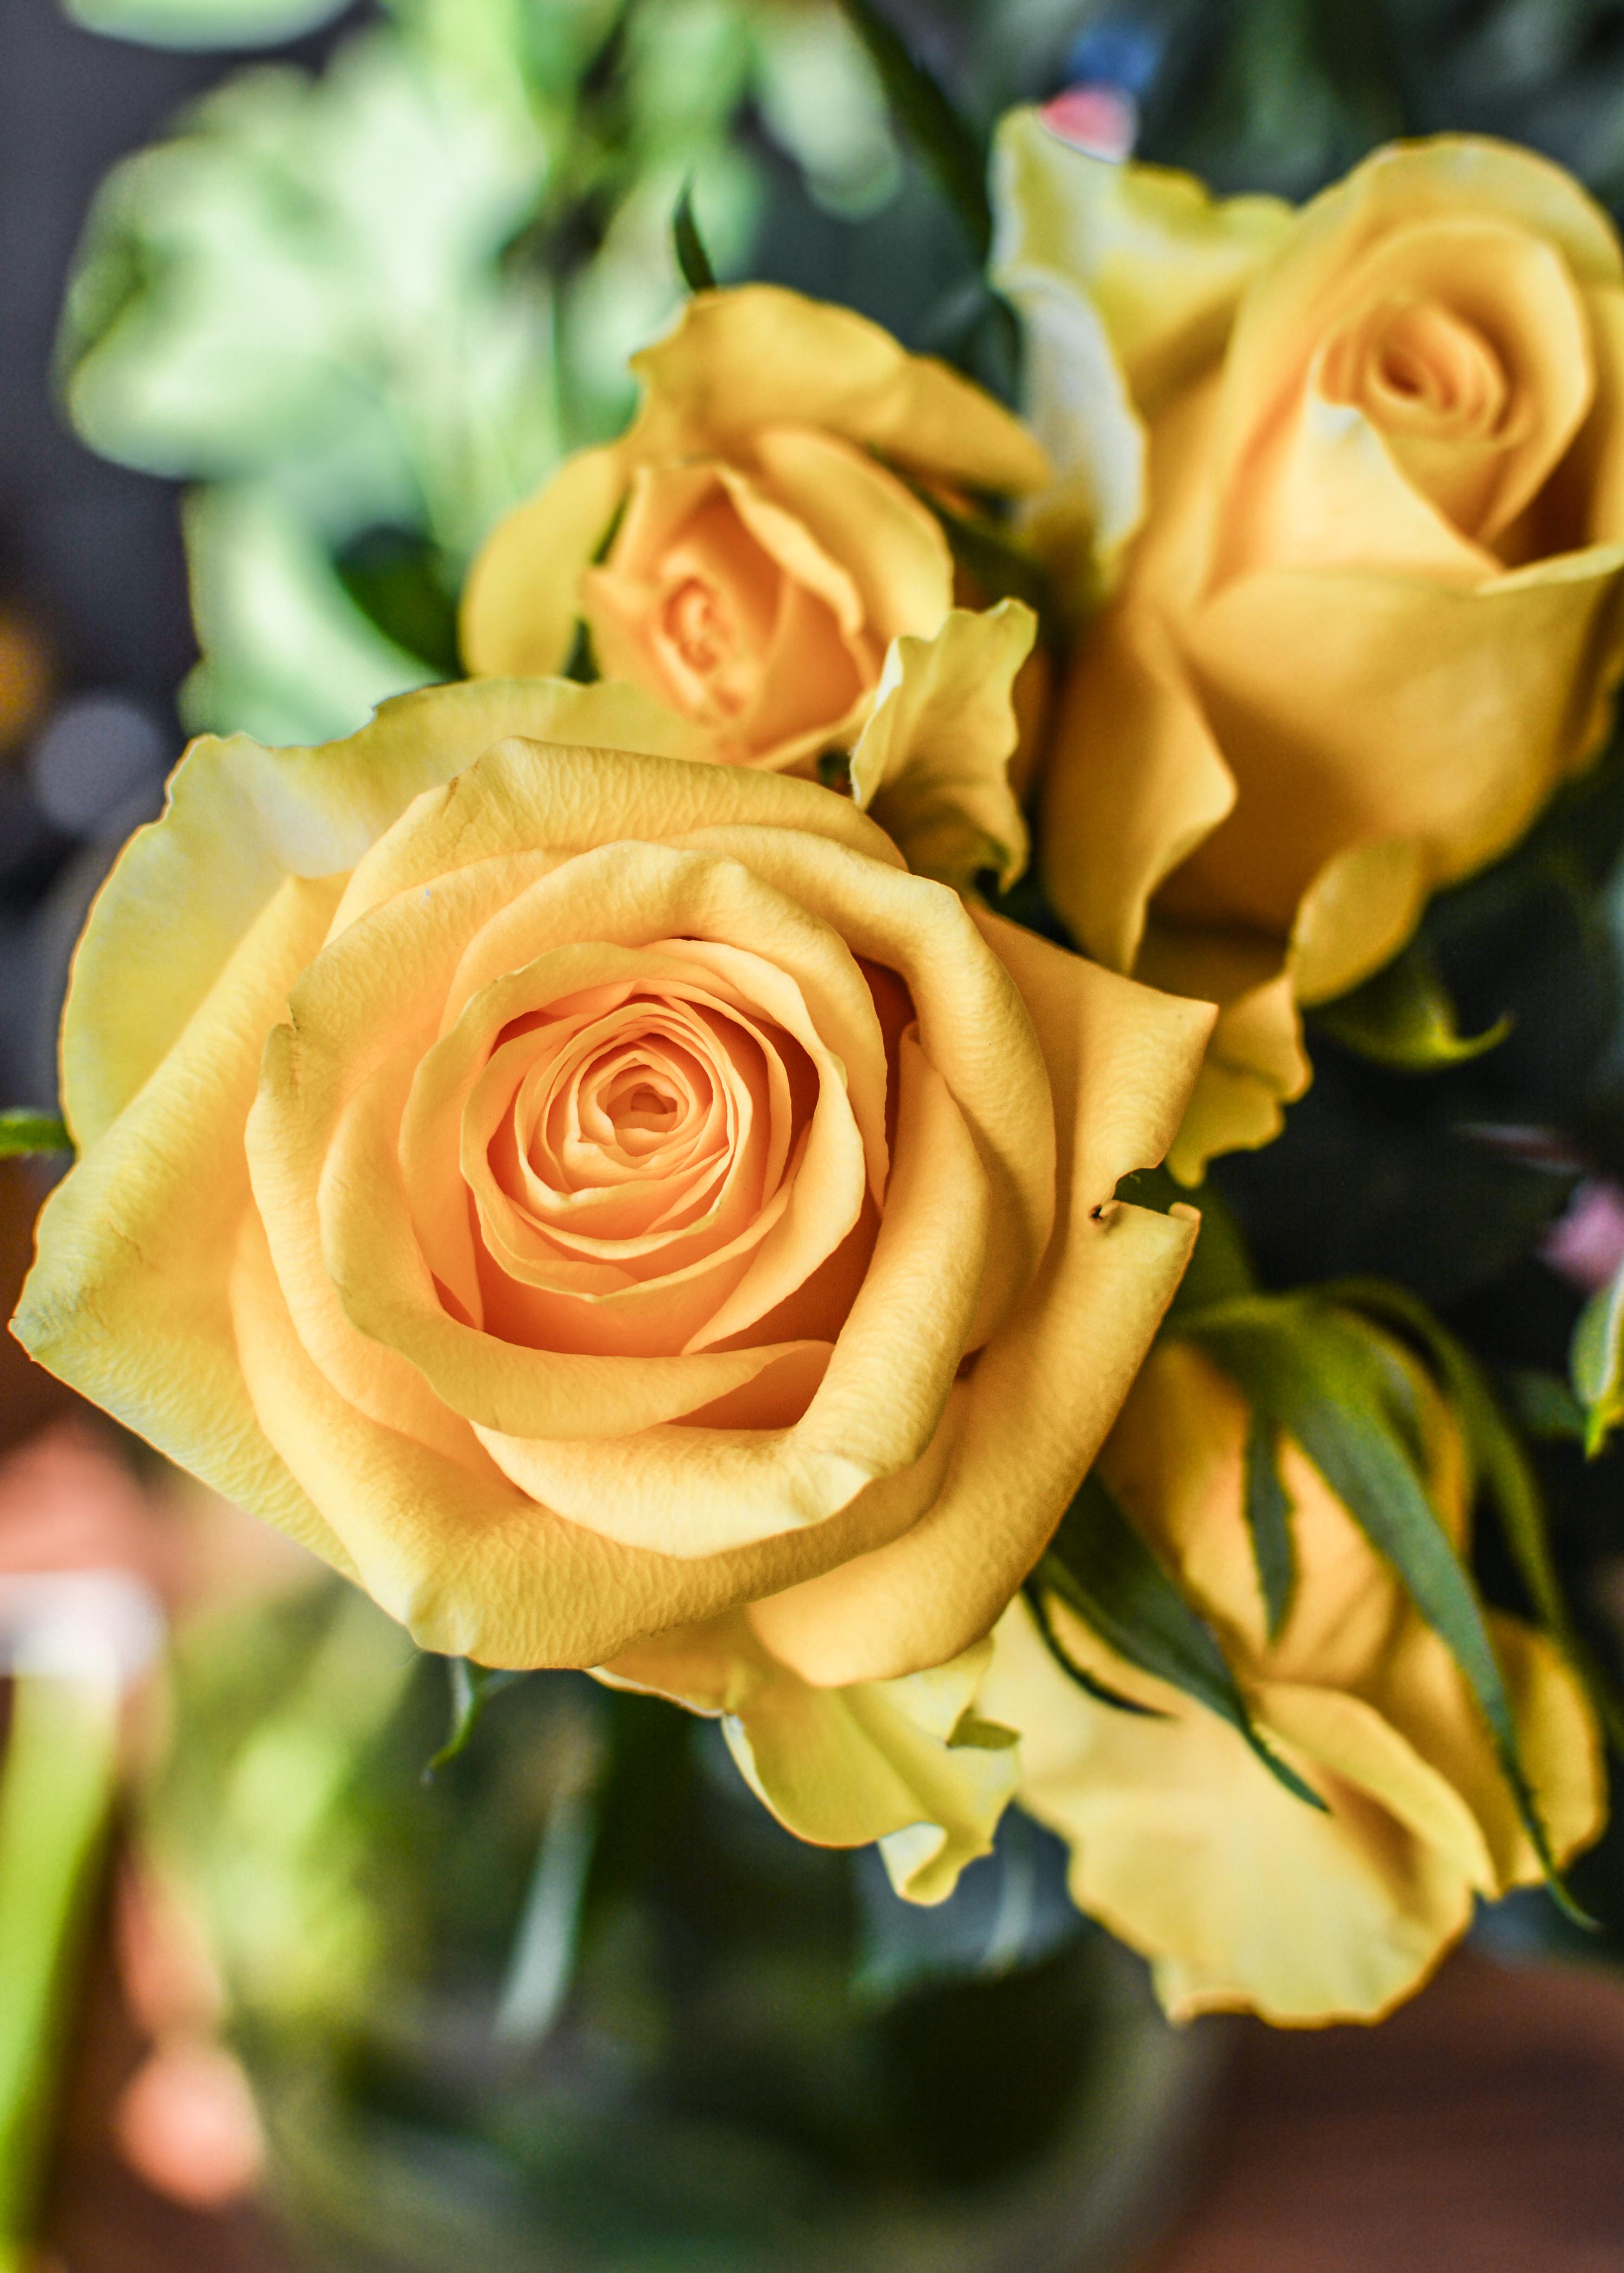 Free Images Anniversary Romance Gift Petal Romantic